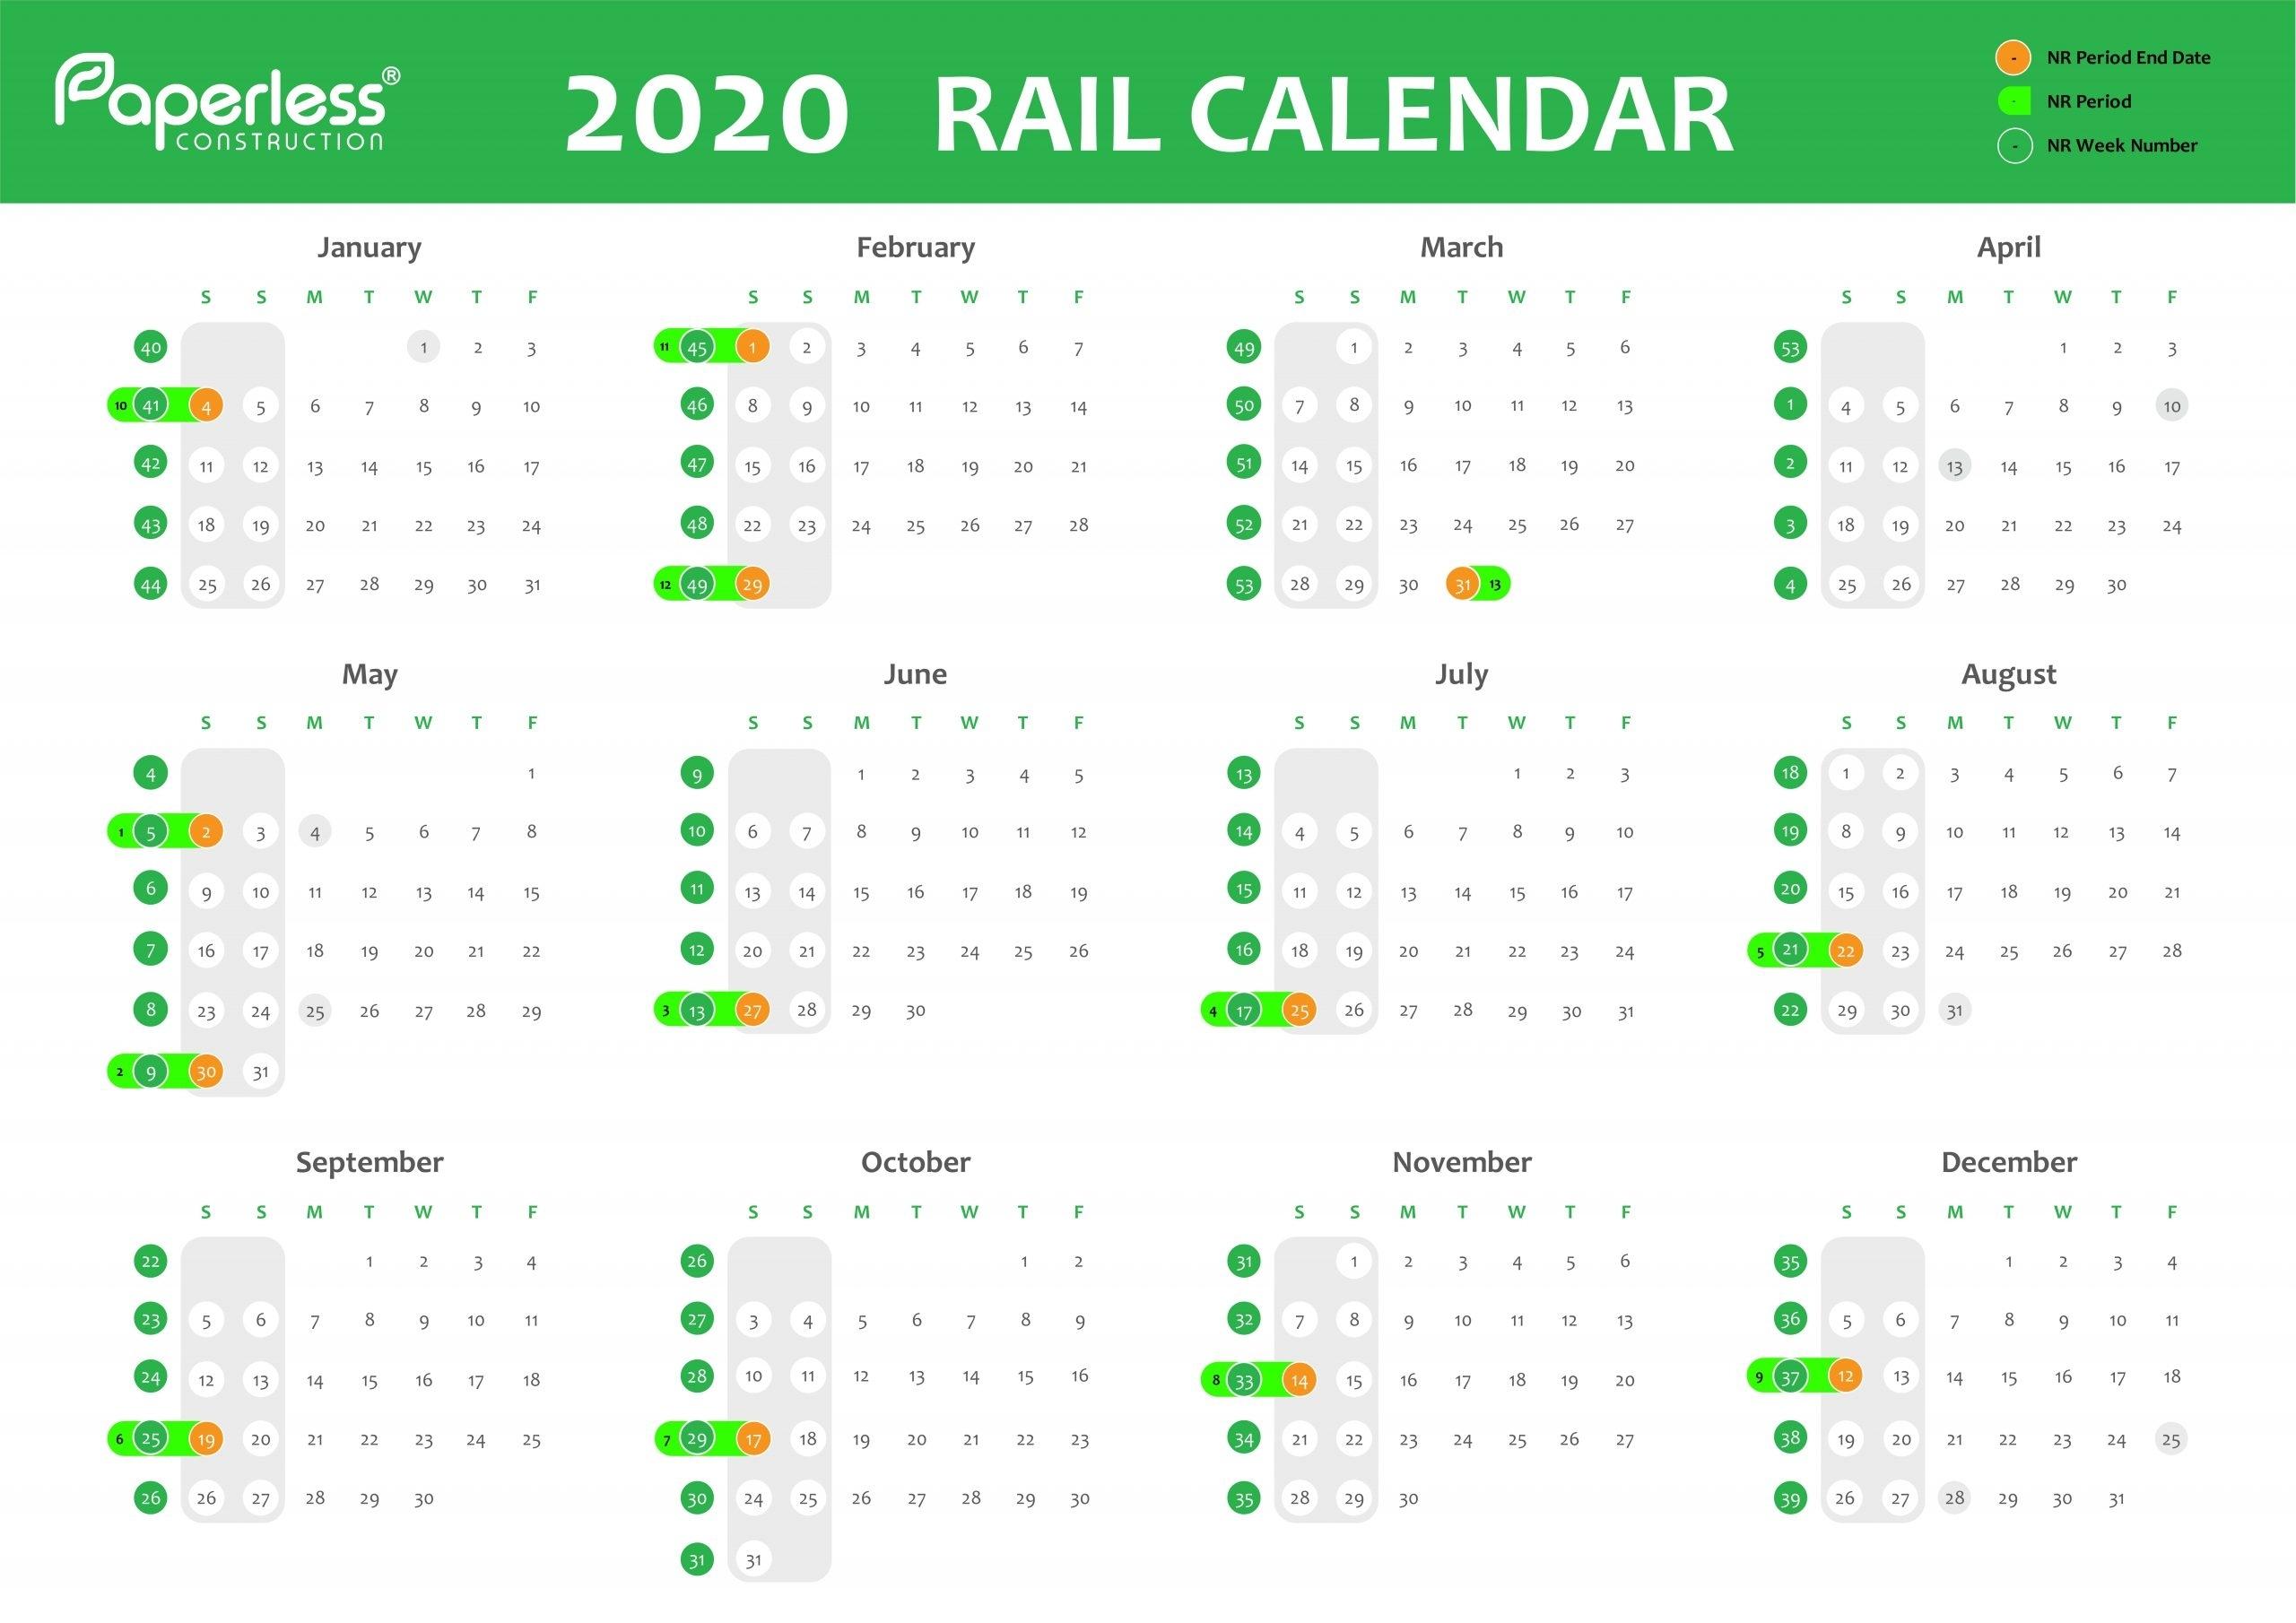 Take Network Rail Week Numbers